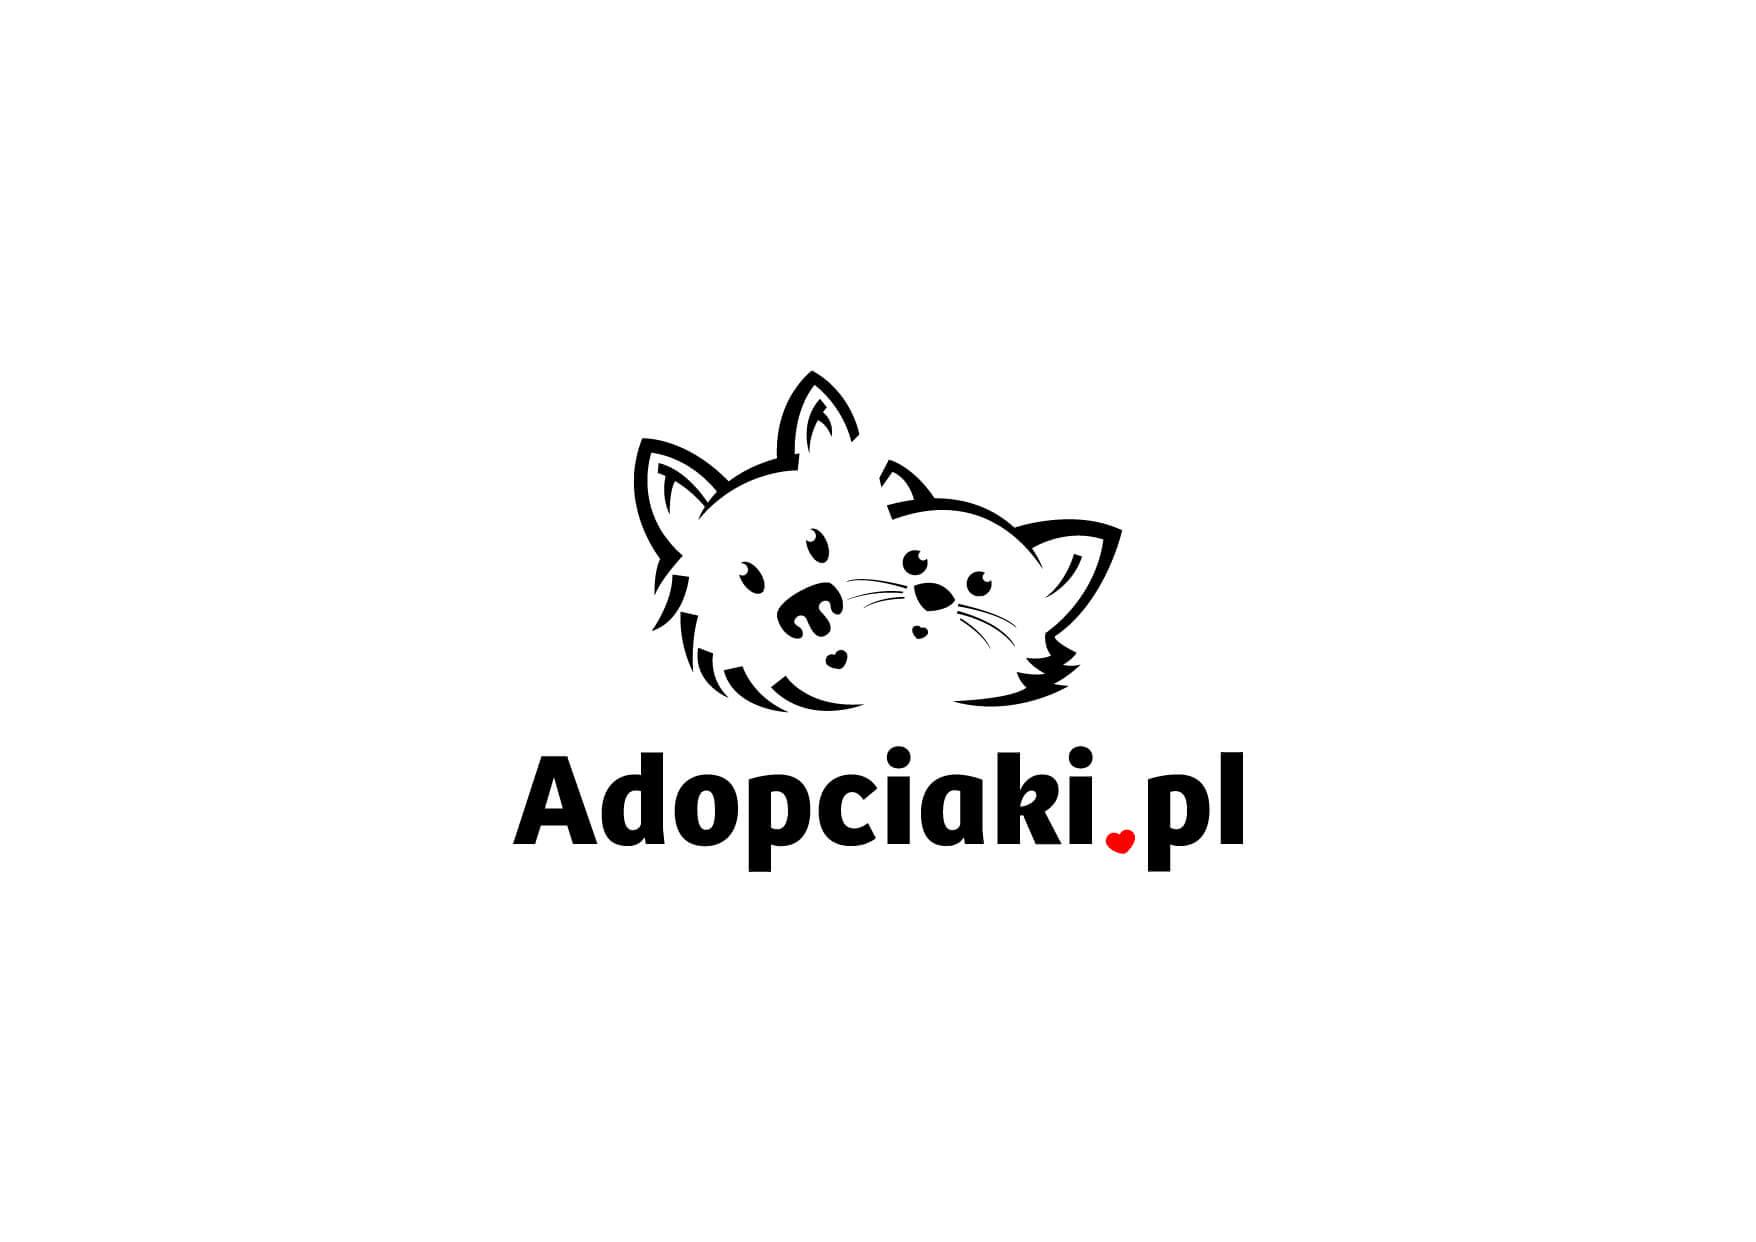 Logo Adopciaki.pl – Gdyni